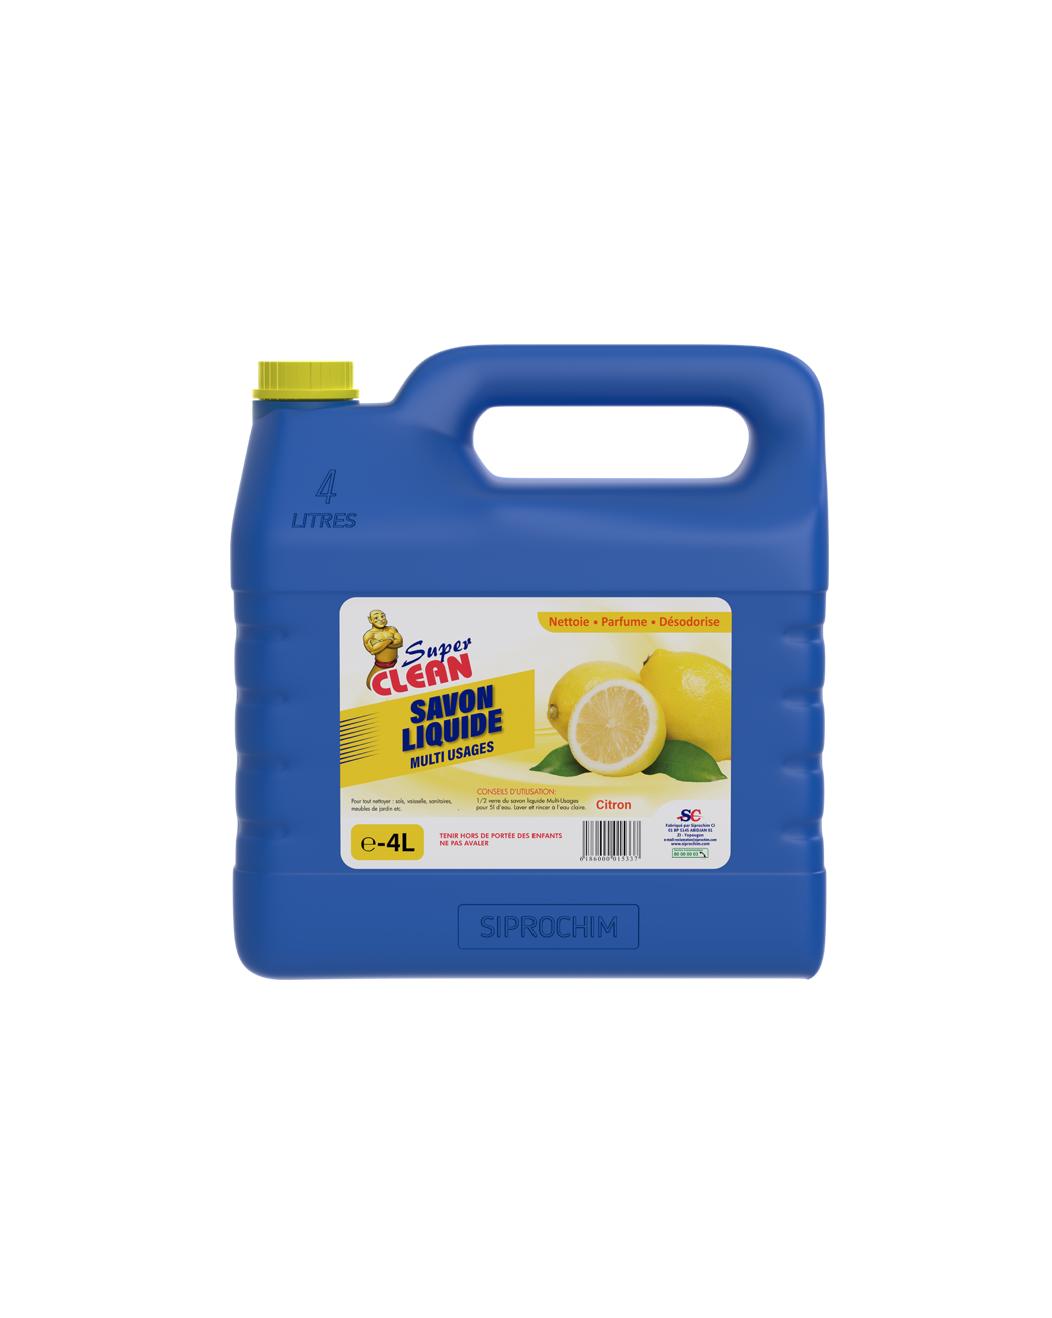 SUPER CLEAN_Savon liquide 4L citron